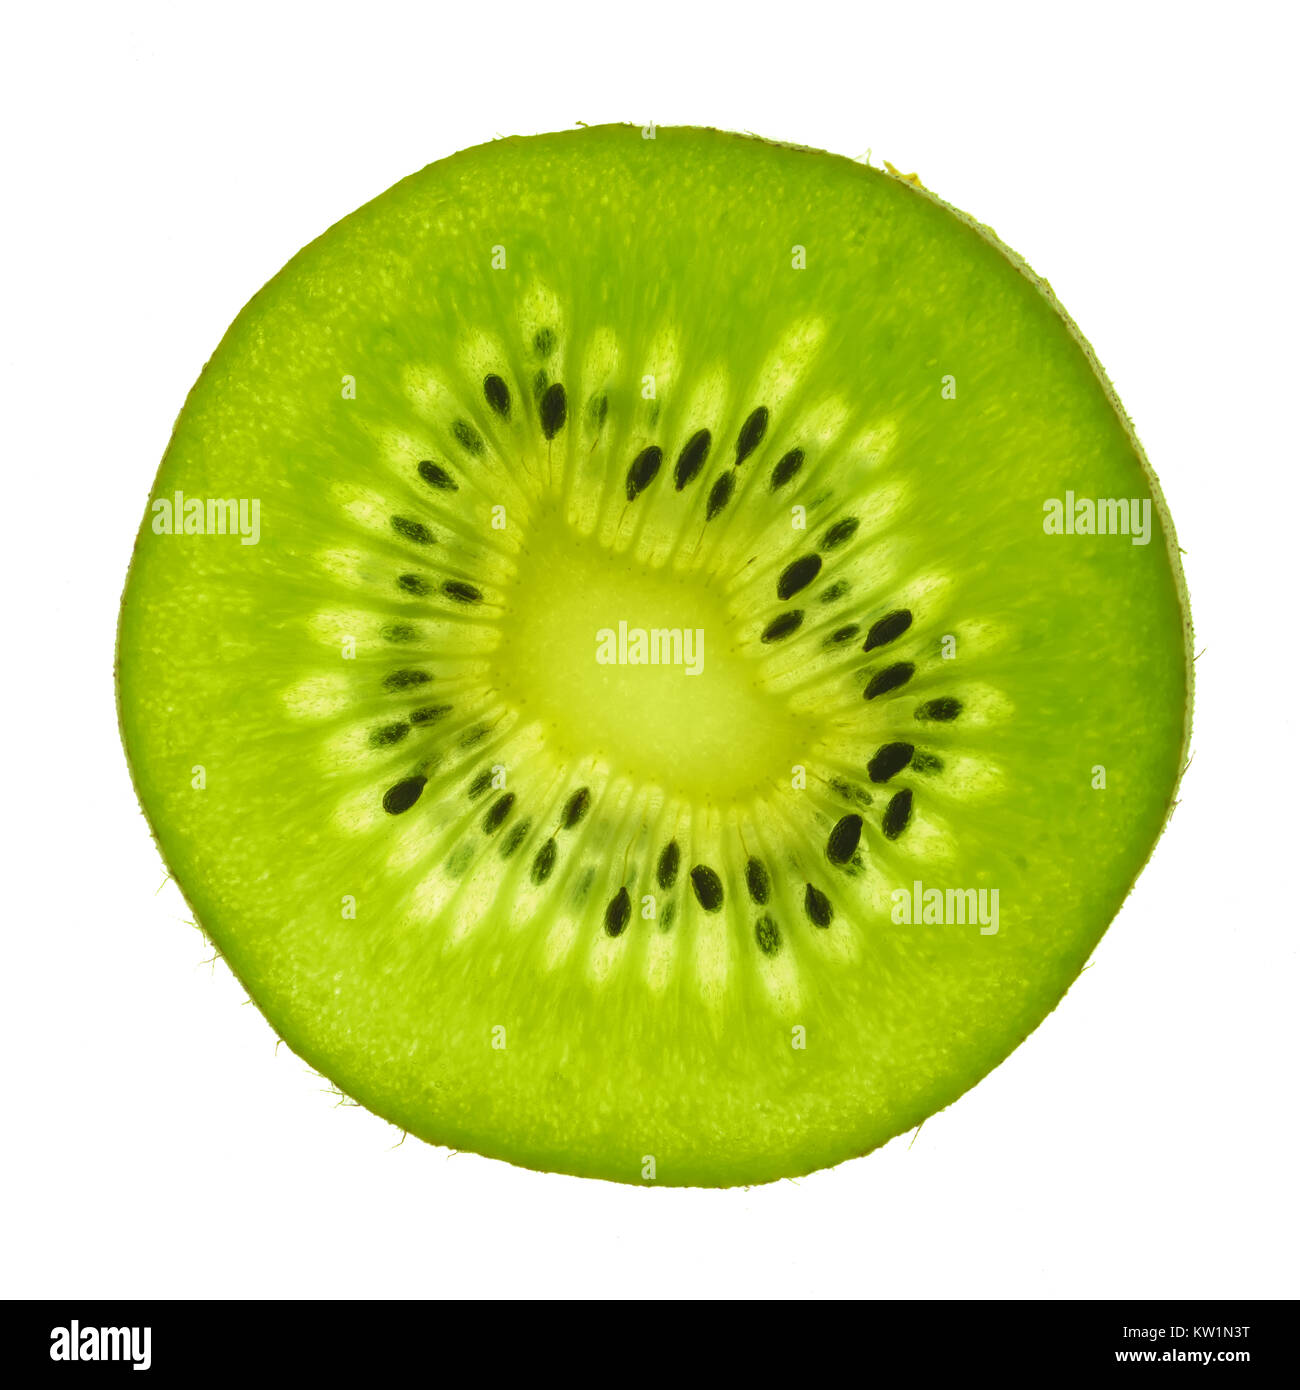 macro top view of a actinidia kiwi fruit slice, backlight - Stock Image